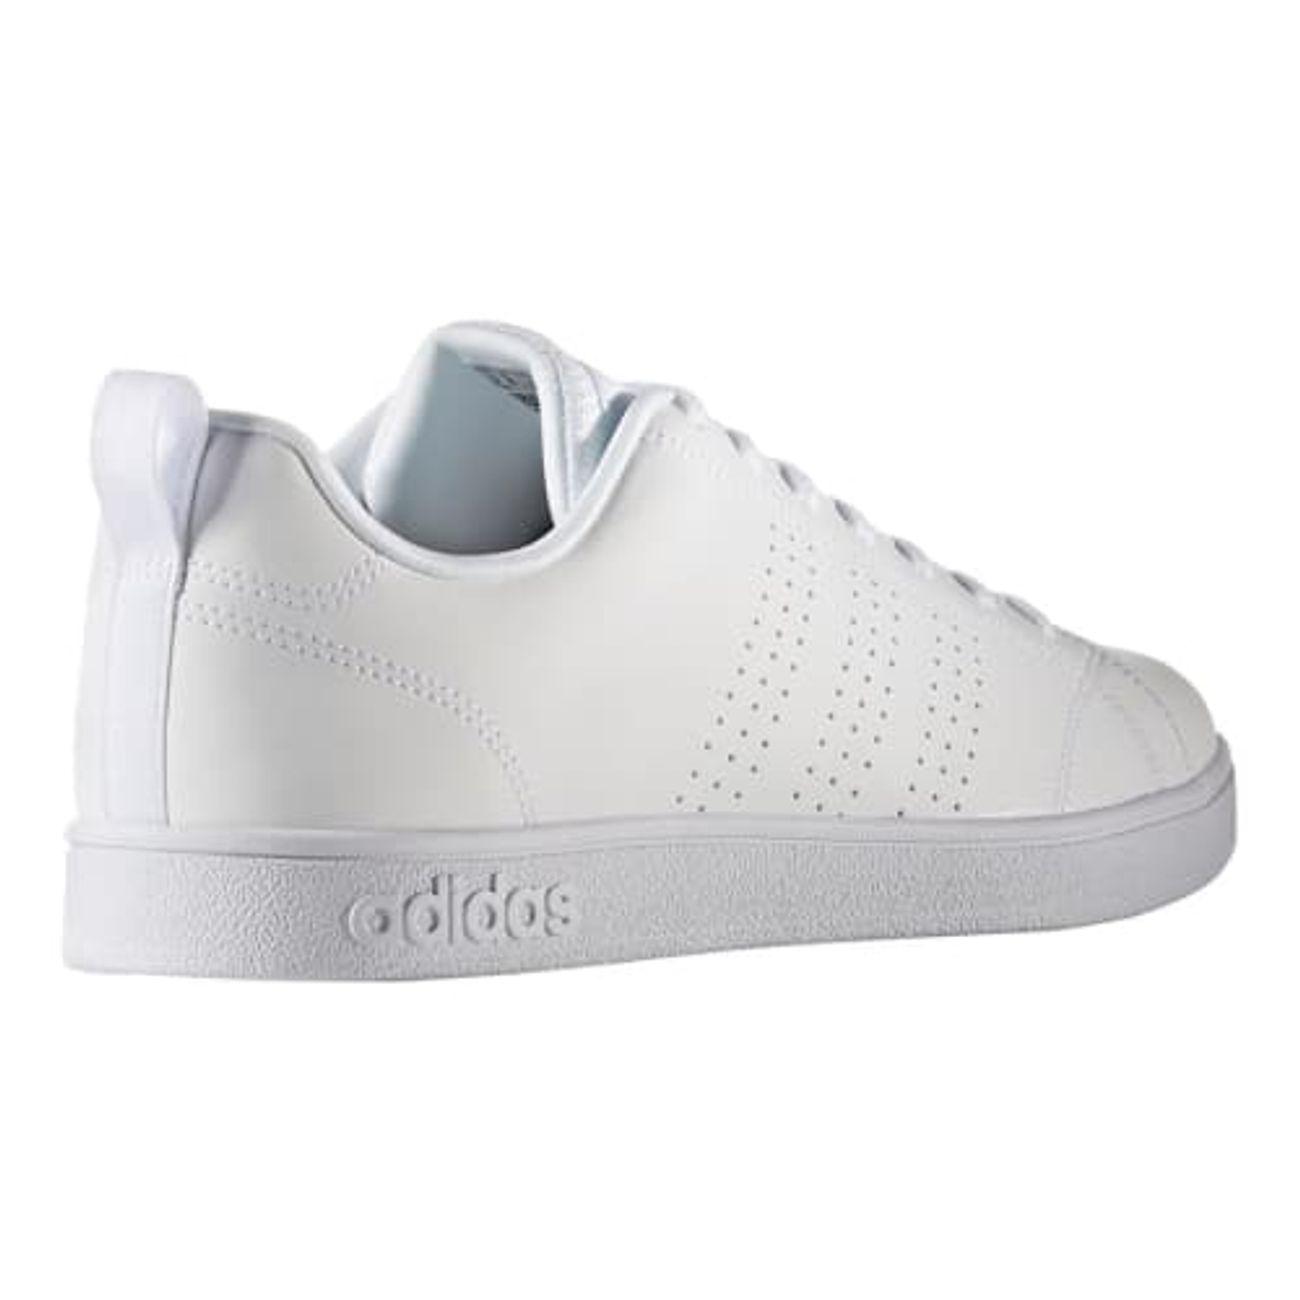 Mode- Lifestyle homme ADIDAS Adidas Neo Advantage Clean VS